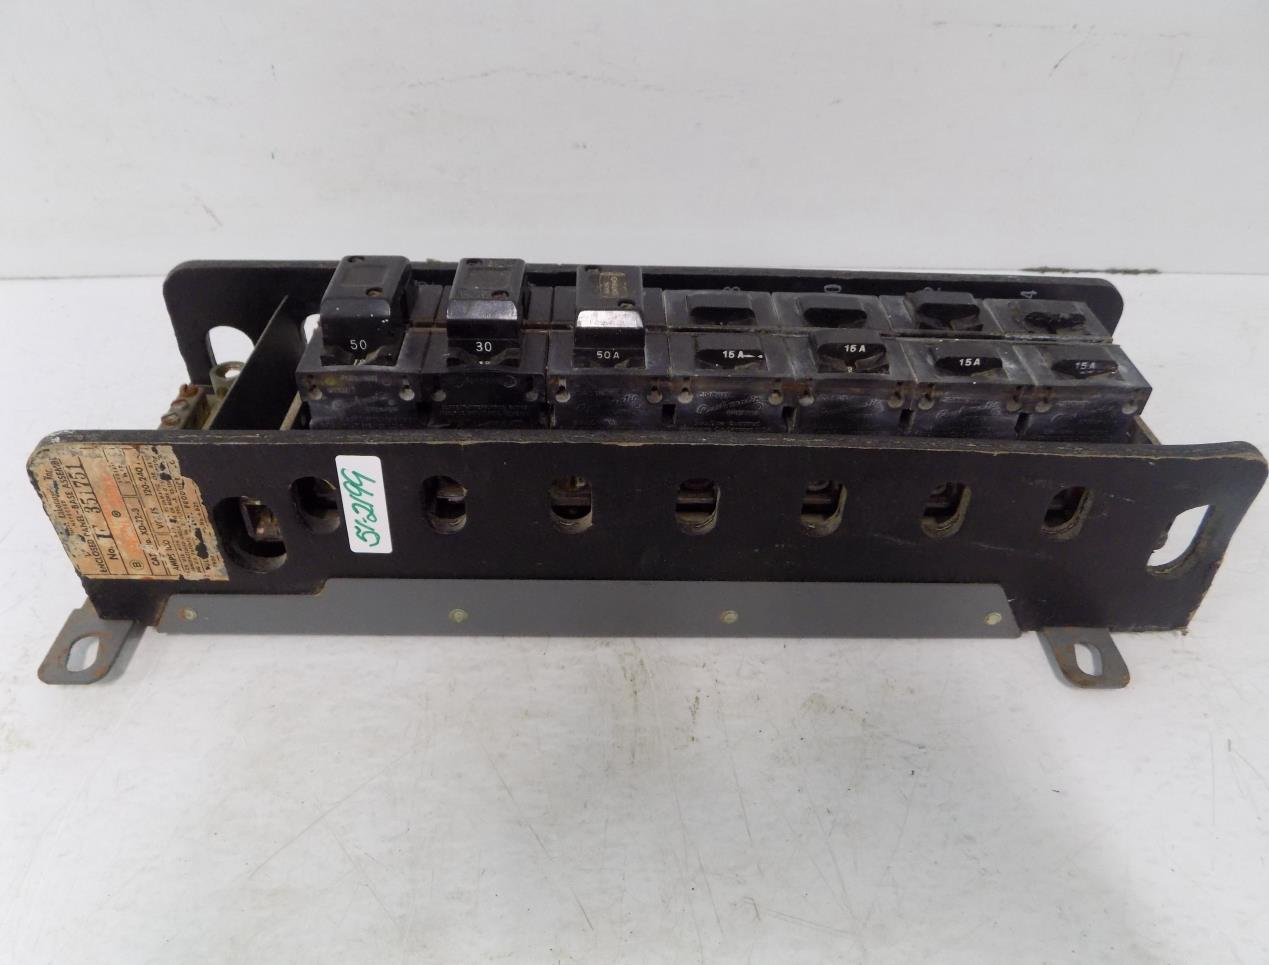 Pushmatic Breaker Panel Diagram Of Circuit Wiring Bulldog Insert W Breakers Xd 12 3